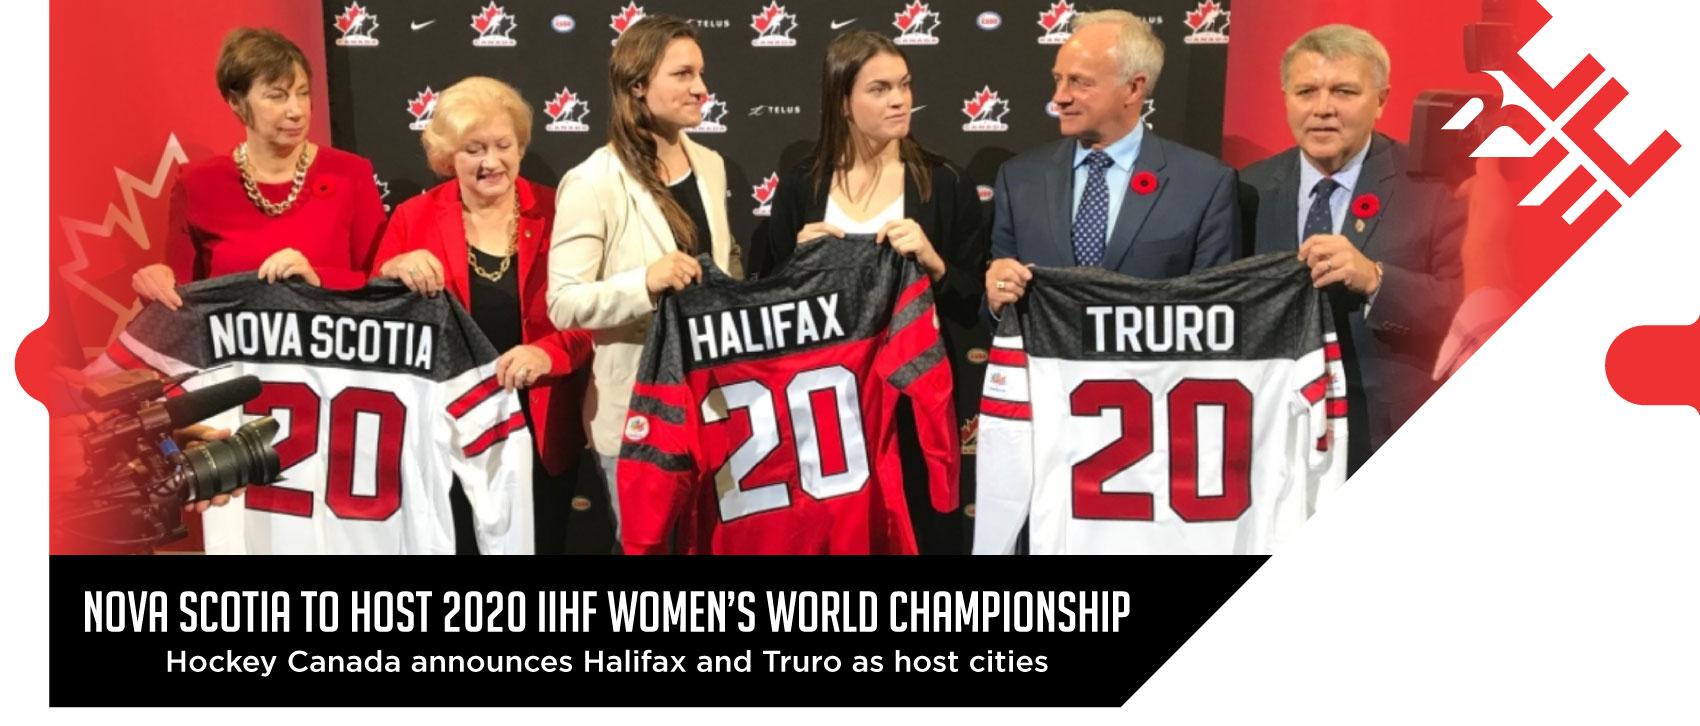 2018-10-30-IIHFWWC-Announce-SLIDER